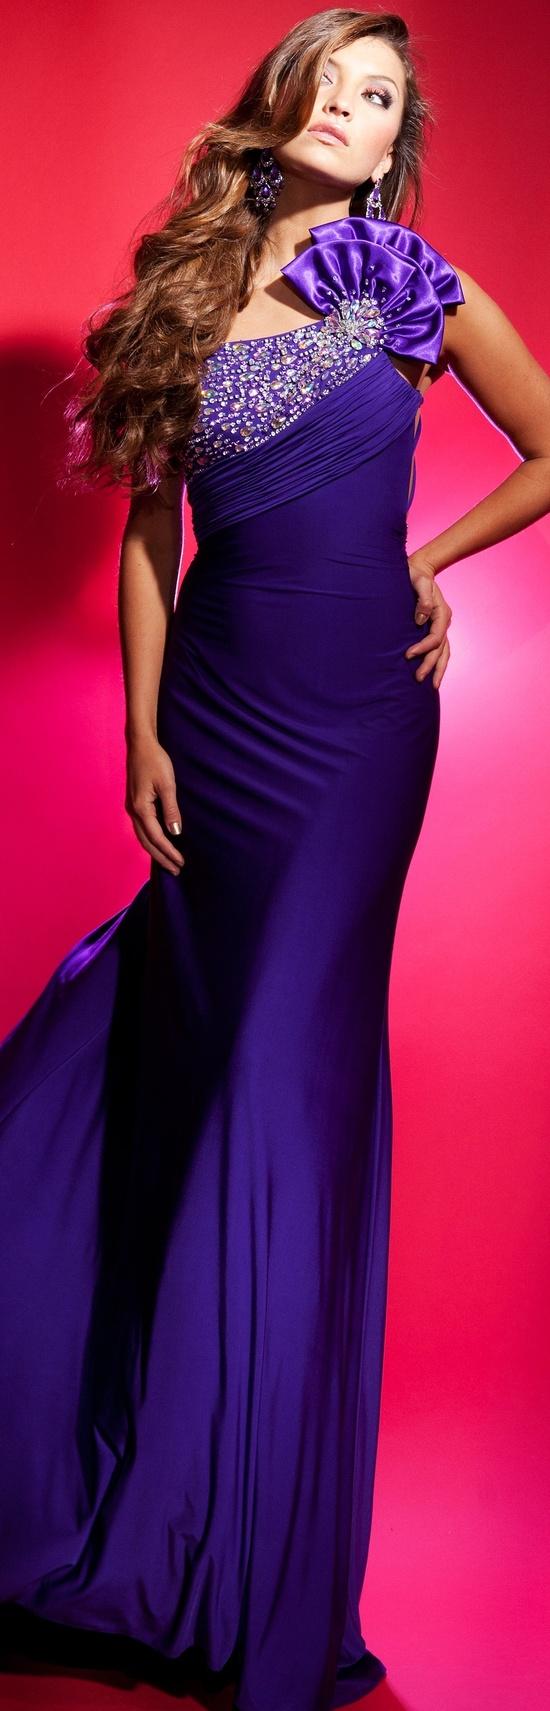 Pin de Normita Martinez en Moda   Pinterest   Vestido elegante, Alta ...